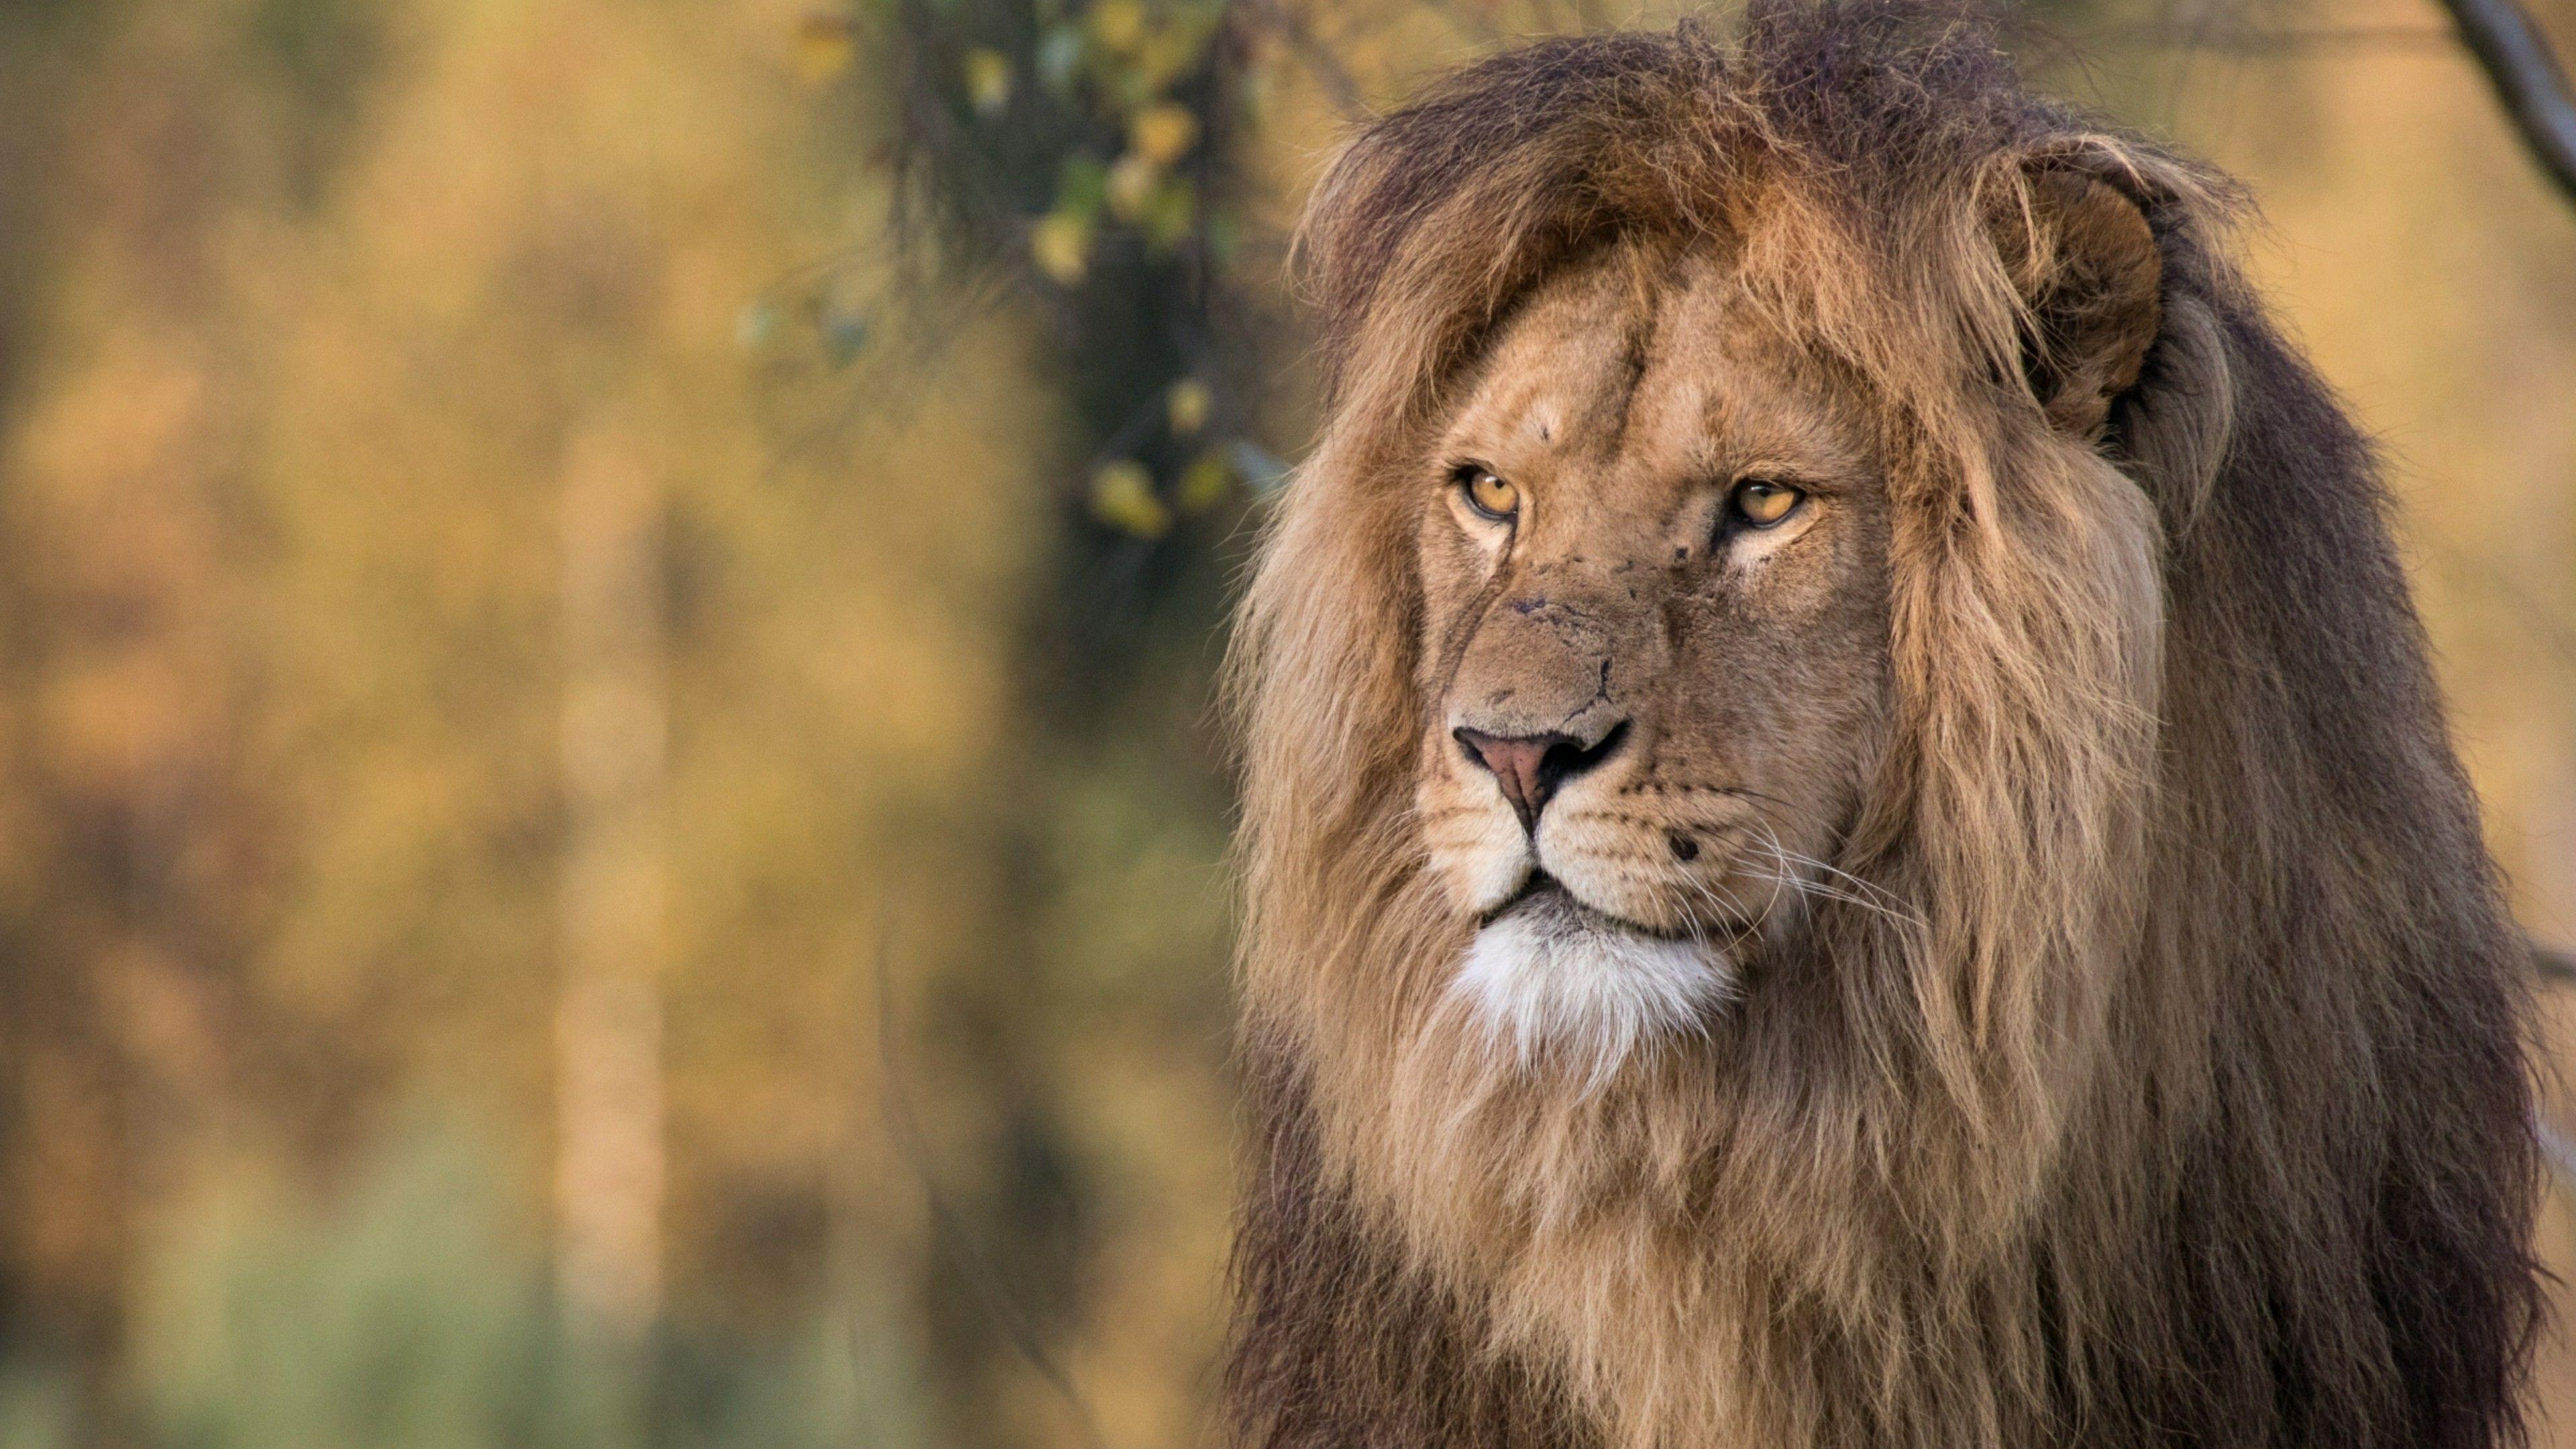 4k Ultra Hd Lions Wallpapers Top Free 4k Ultra Hd Lions